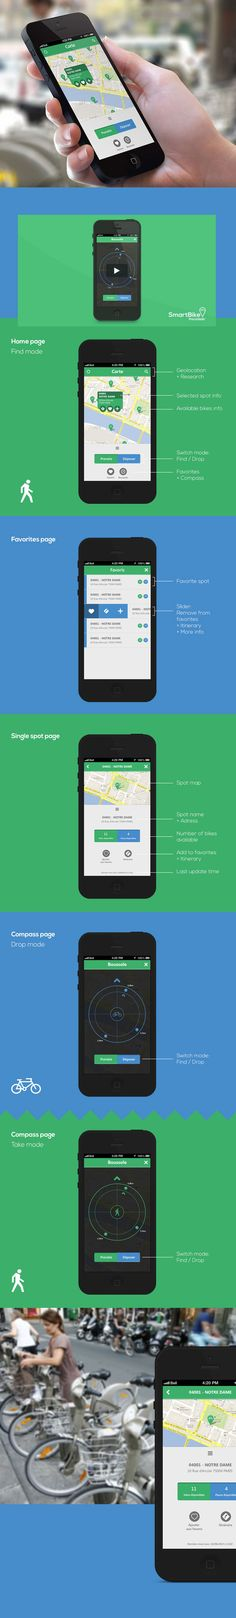 SmartBike App